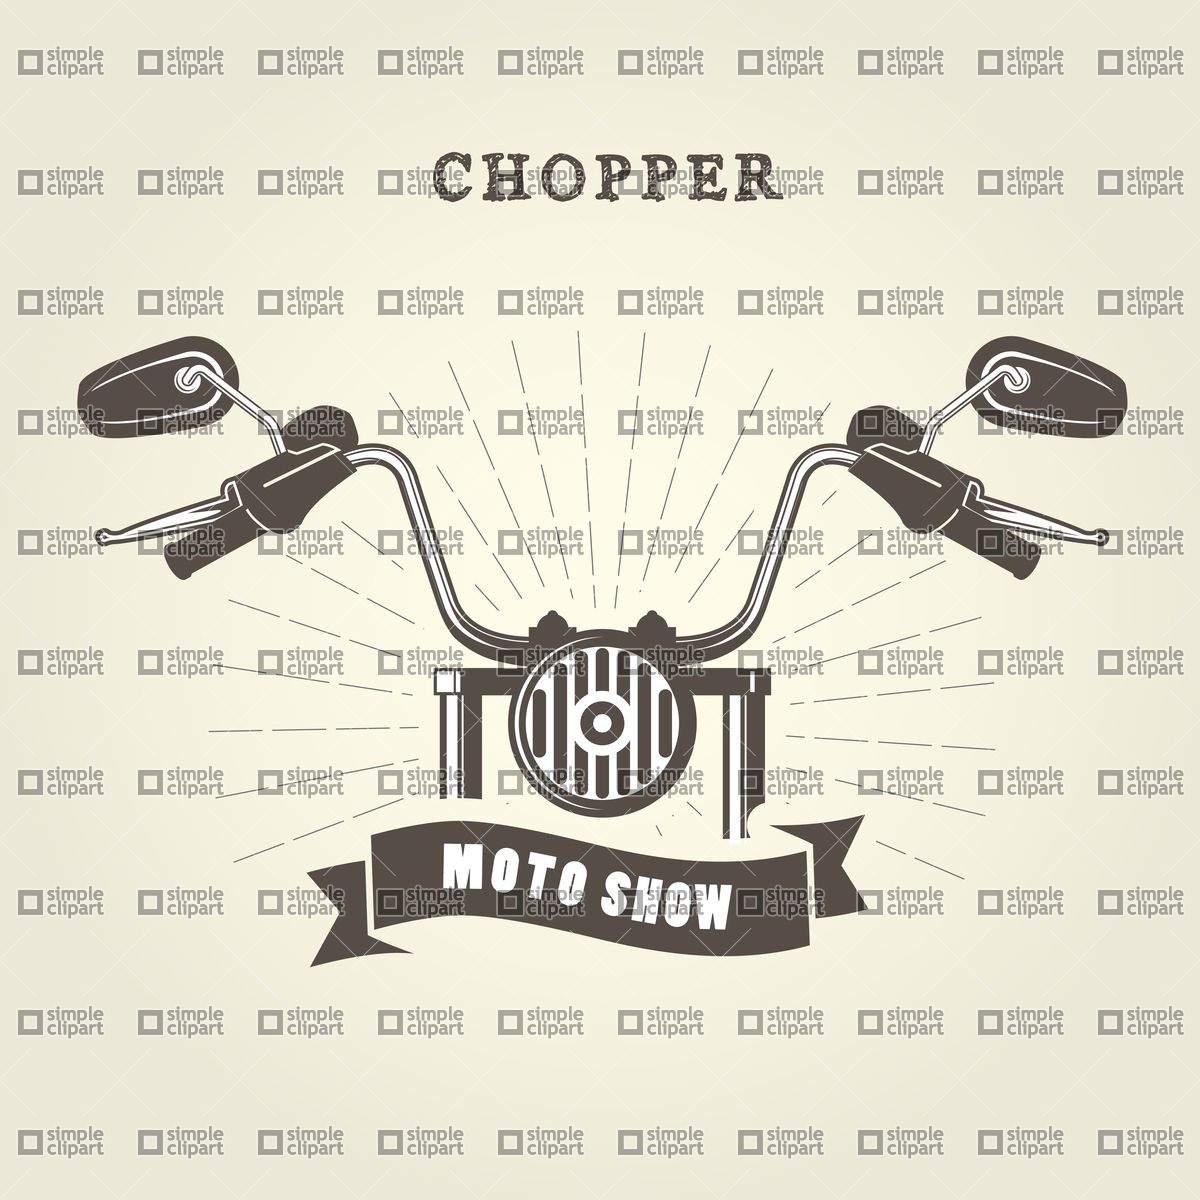 1200x1200 Chopper Moto Handlebar With Rear View Mirrors Vector Image